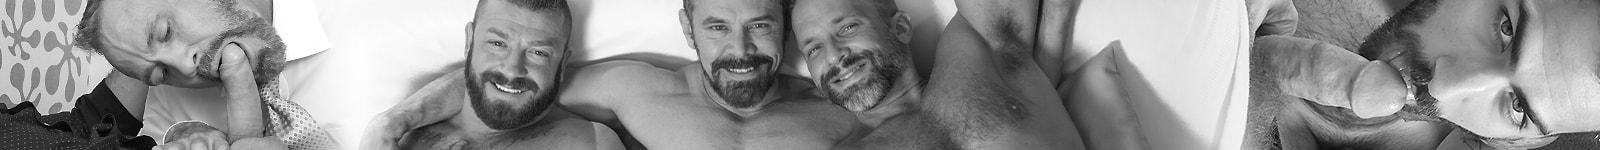 TitanMen Iconic Gay Porn Studio